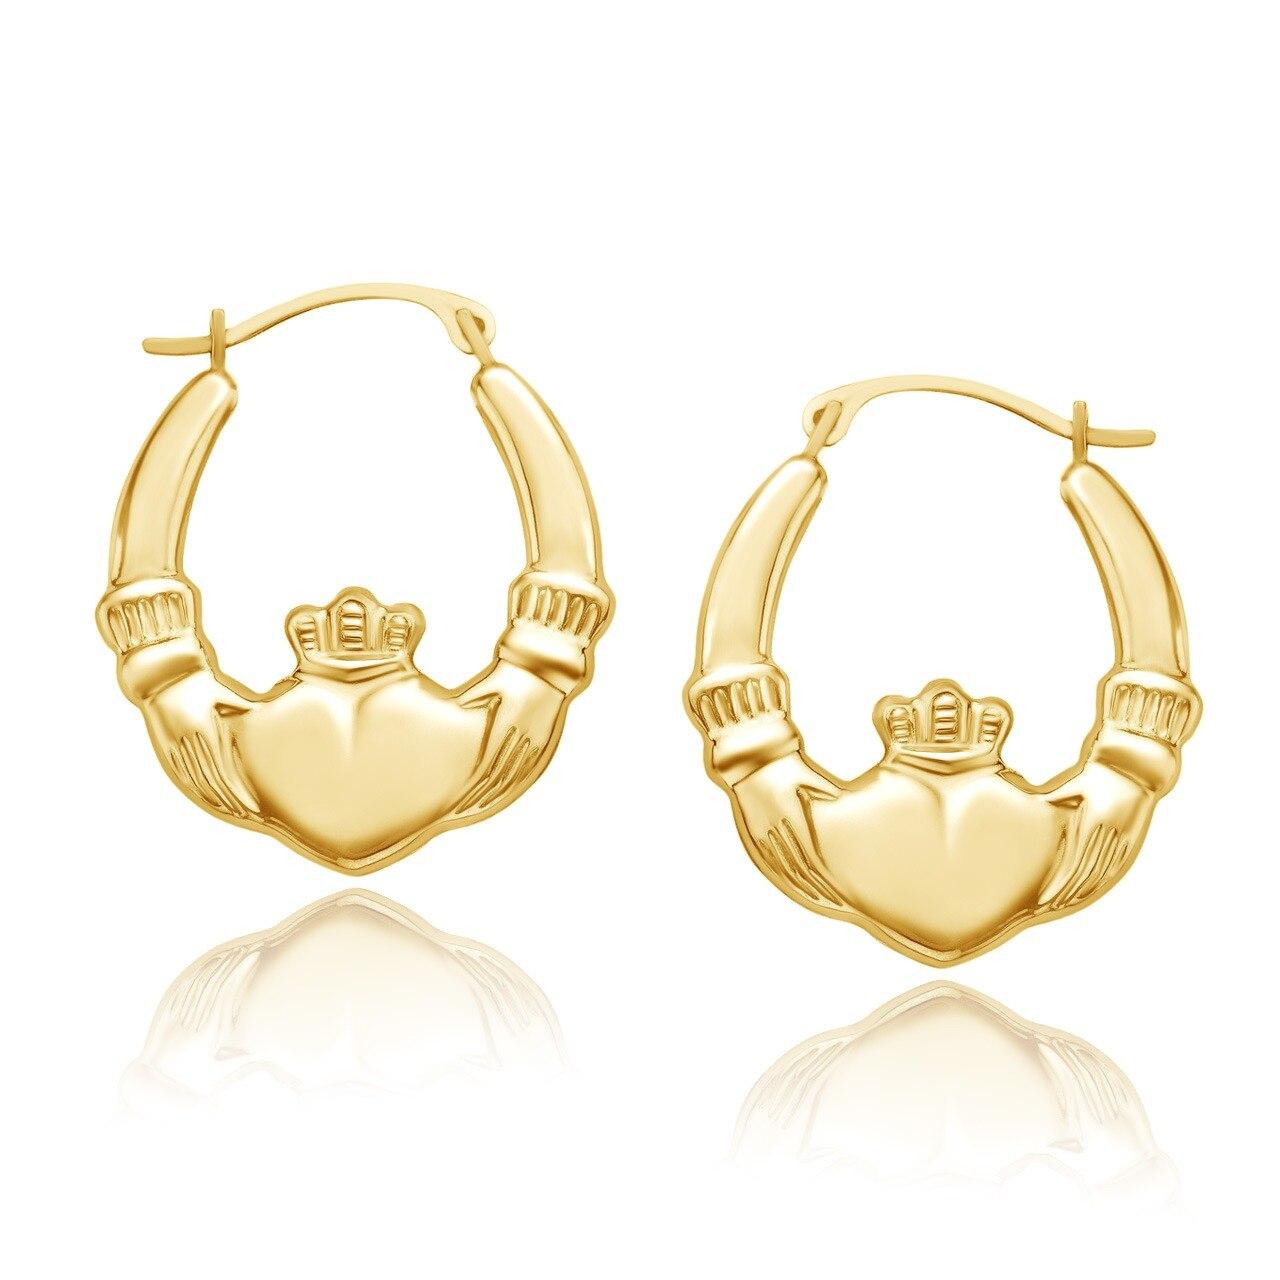 Gold Claddagh Hoop Earrings in 10K Gold gold triangle hoop earrings